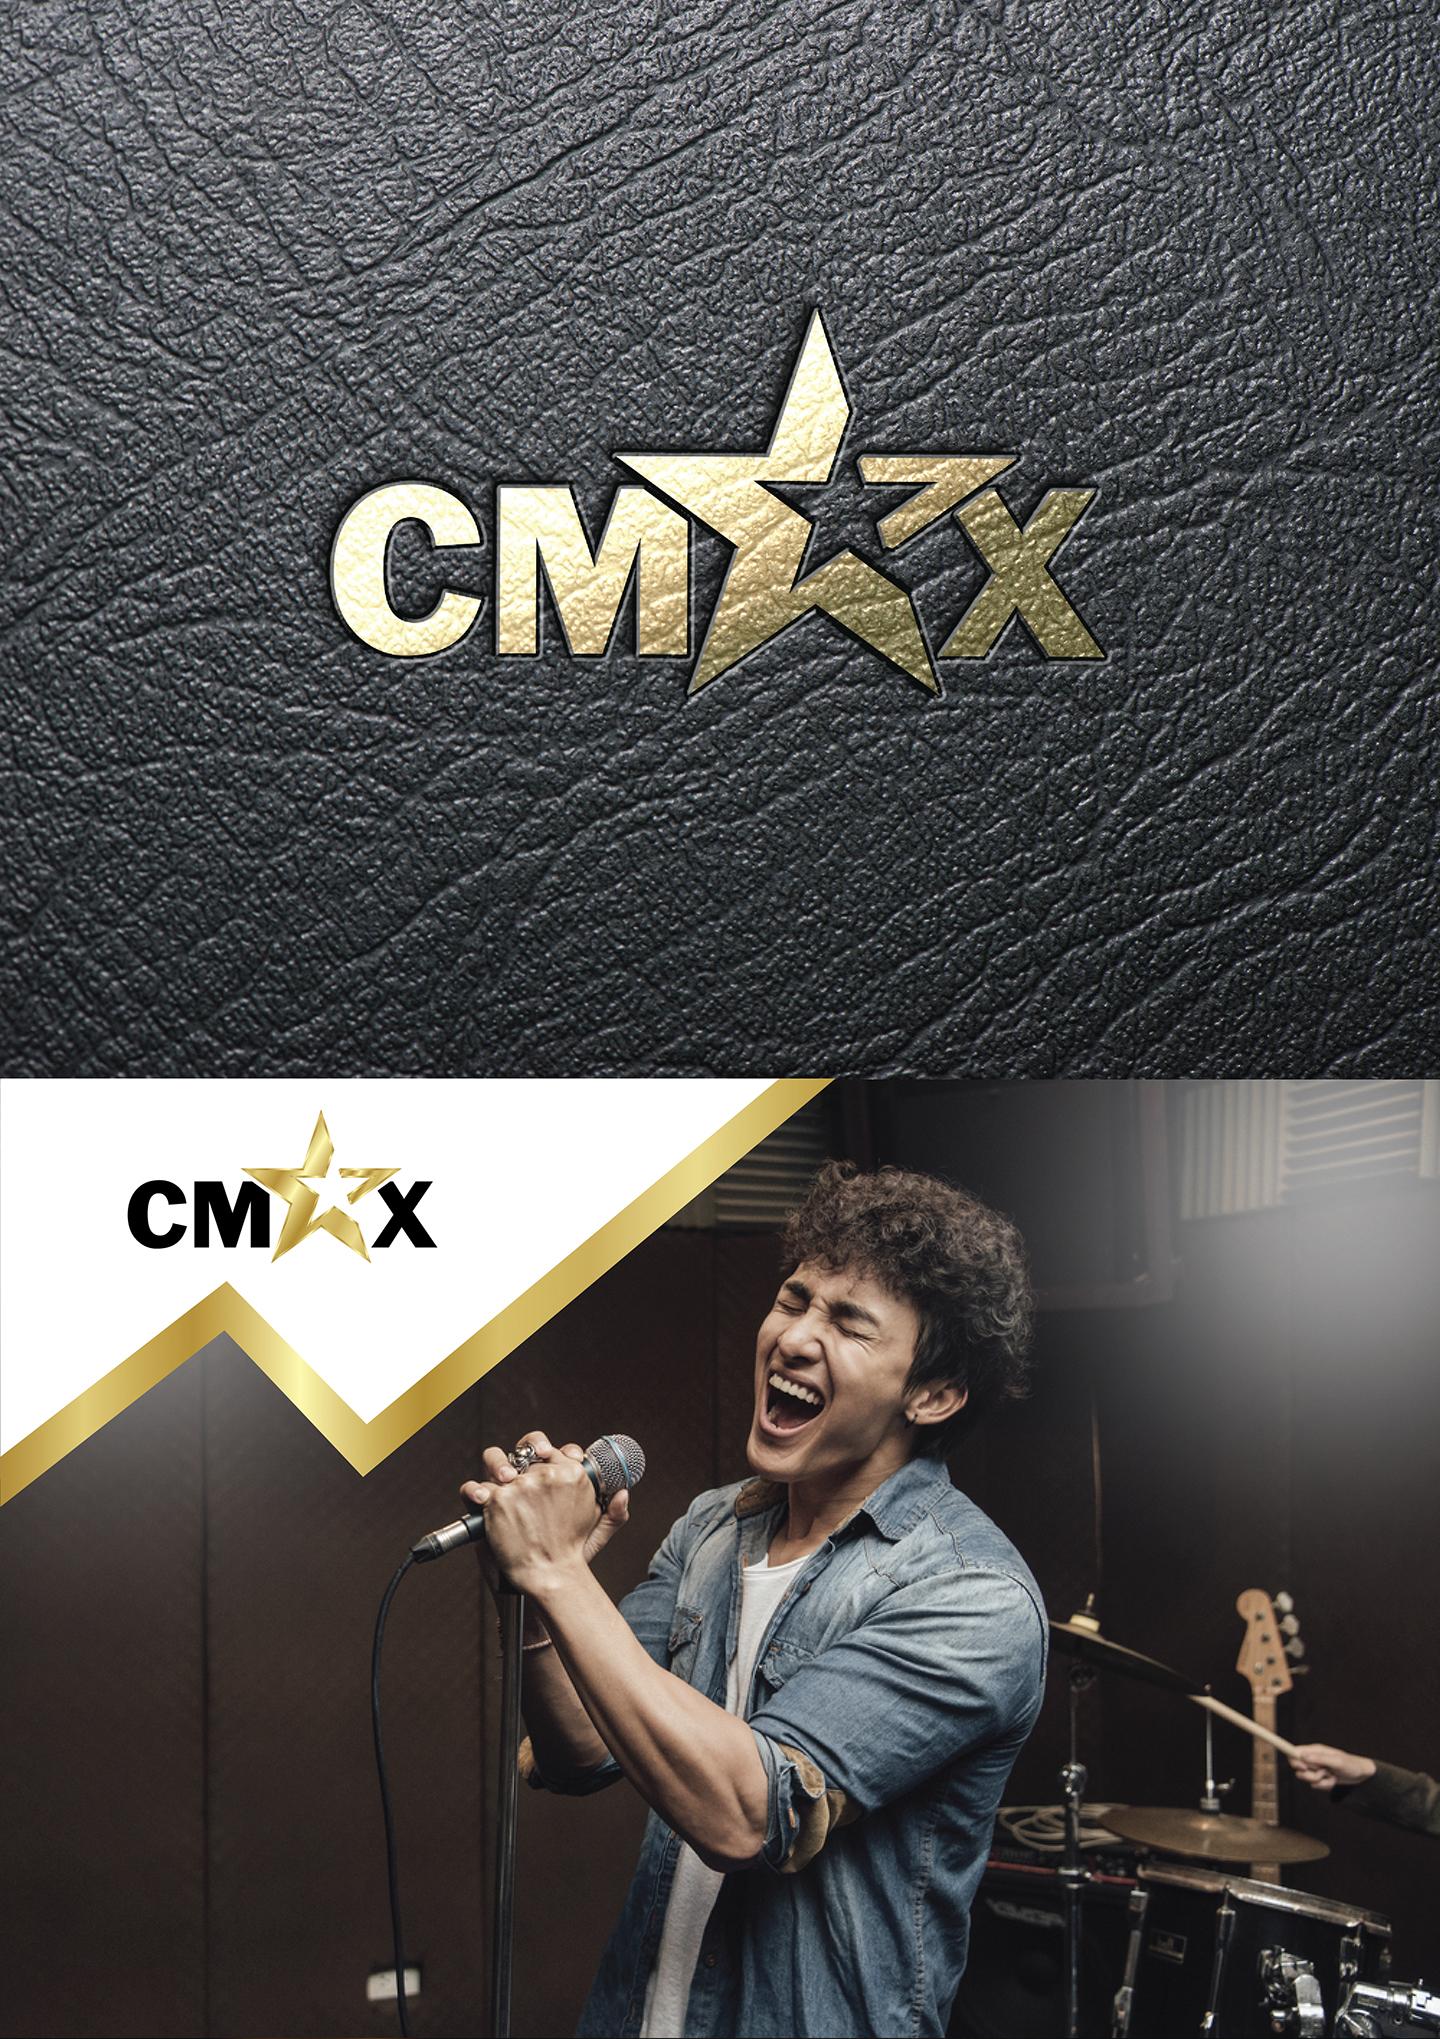 cmax (G)